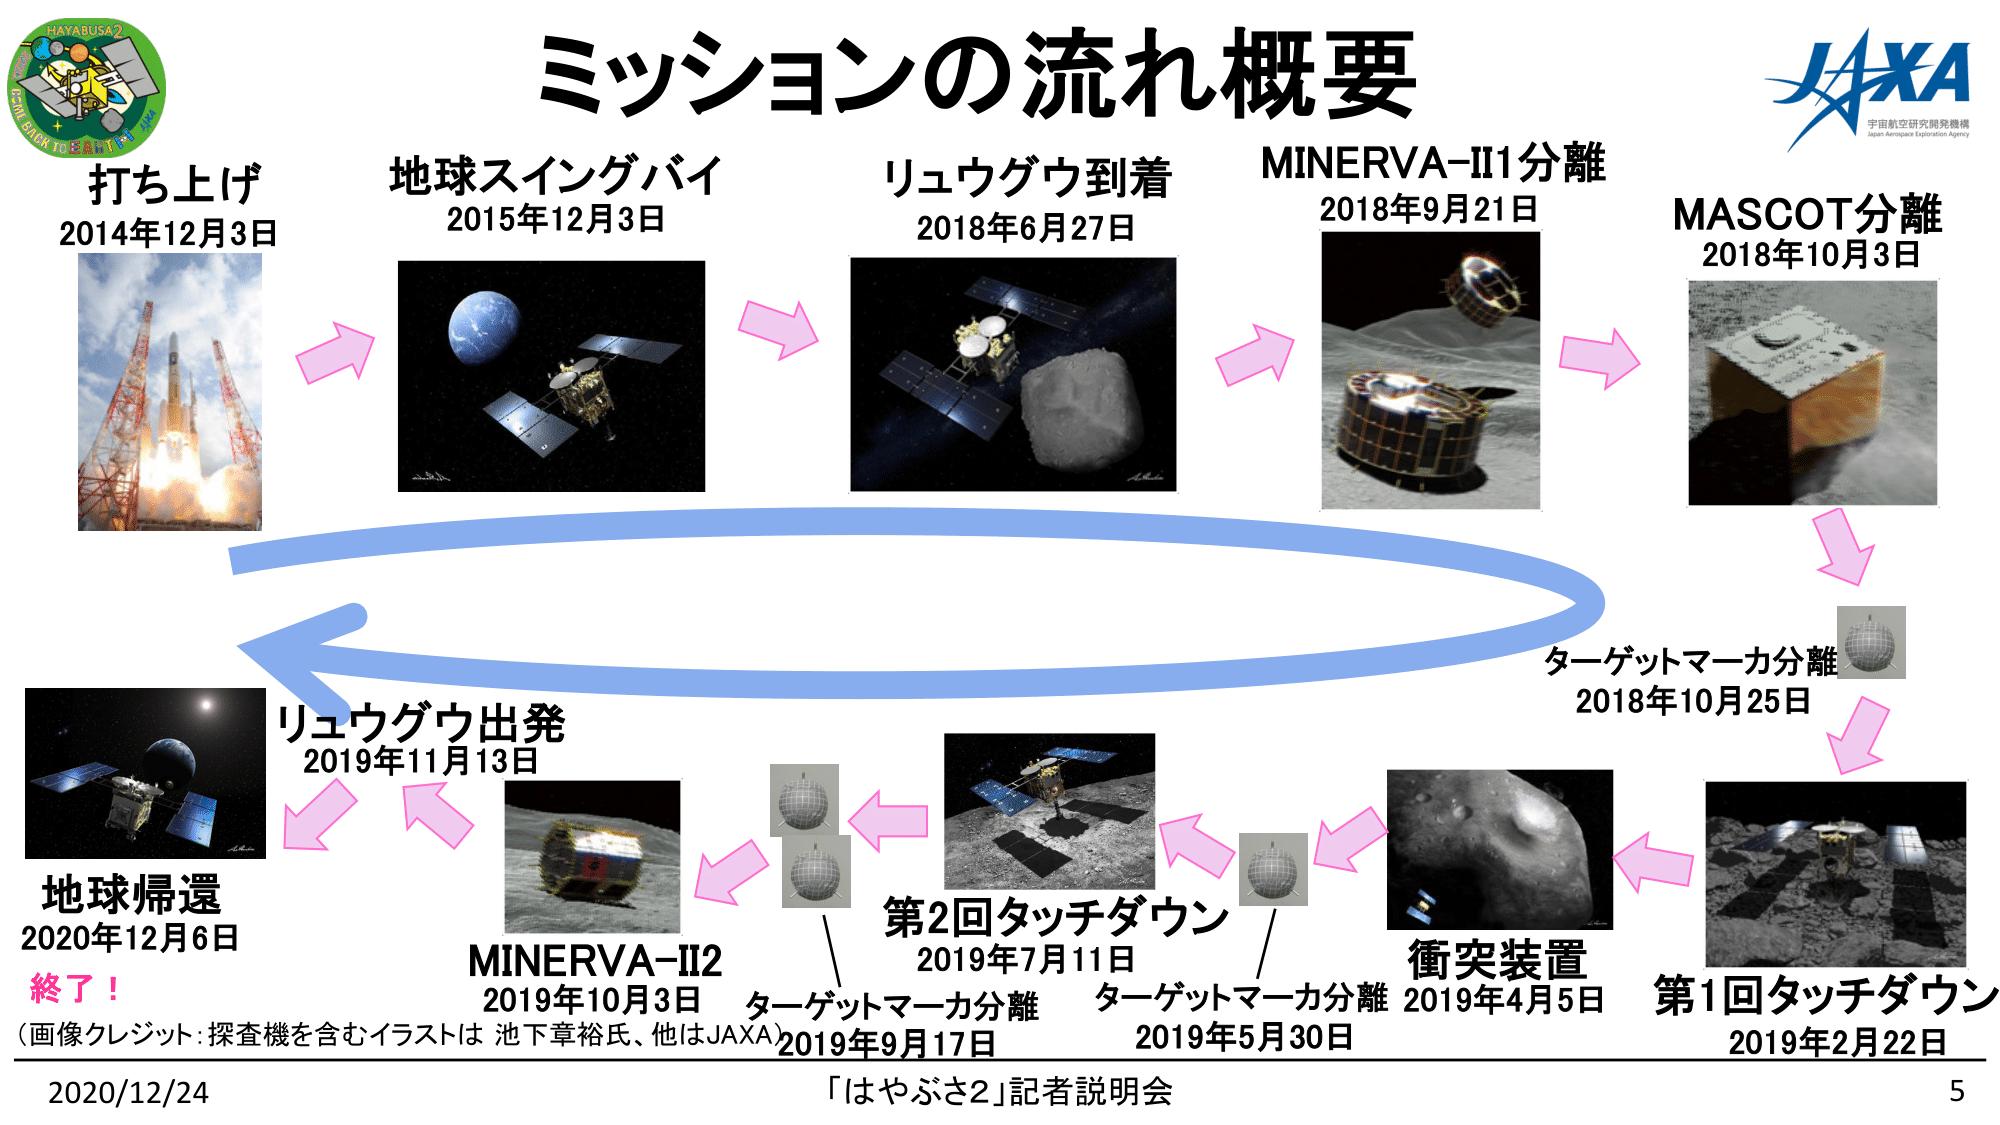 f:id:Imamura:20201224135005p:plain